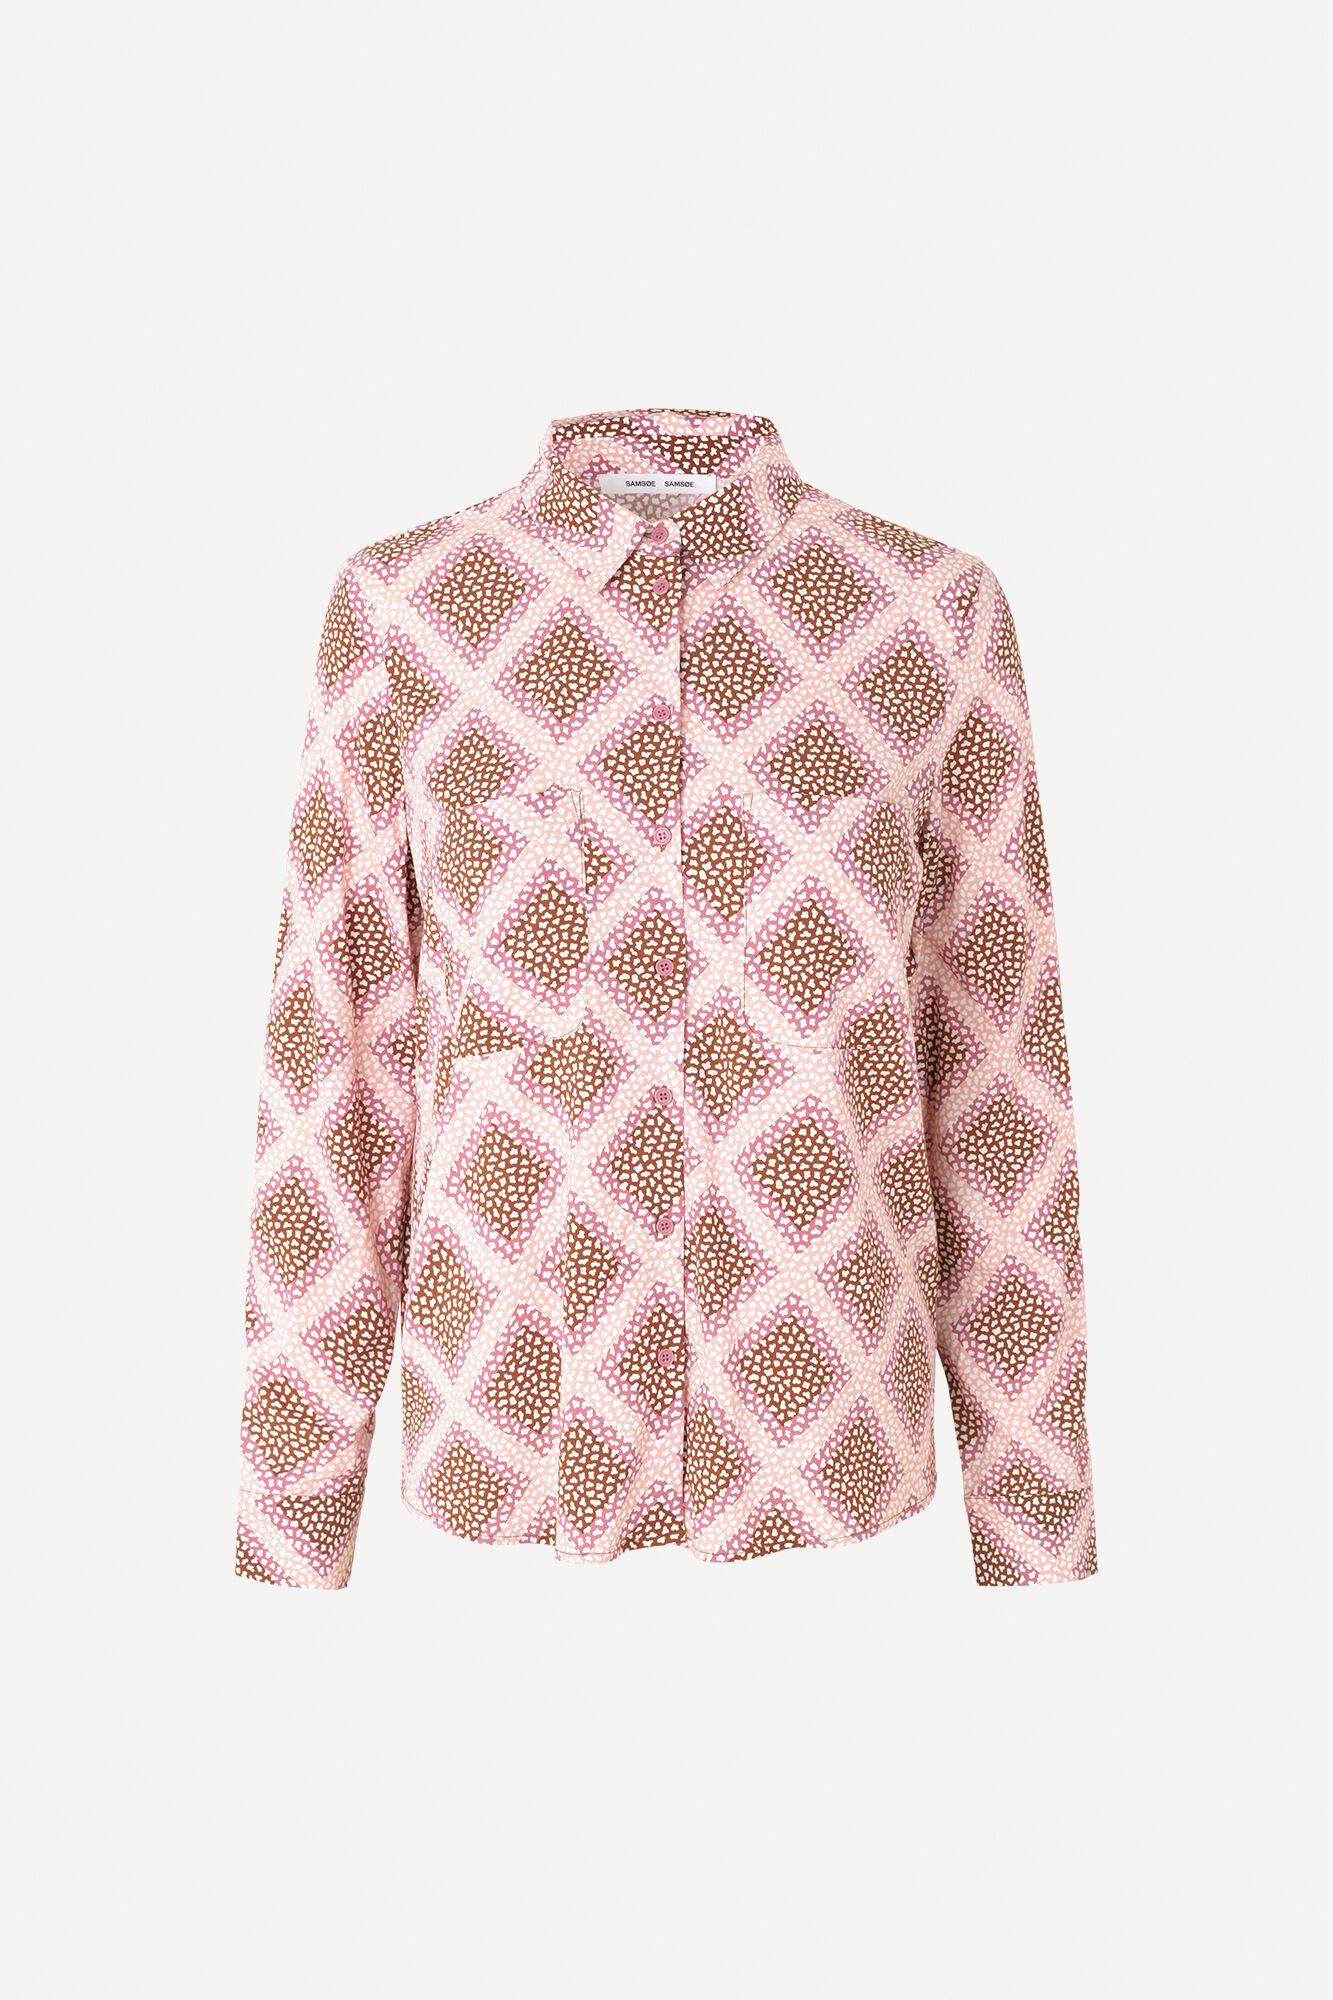 Milly shirt aop 9942